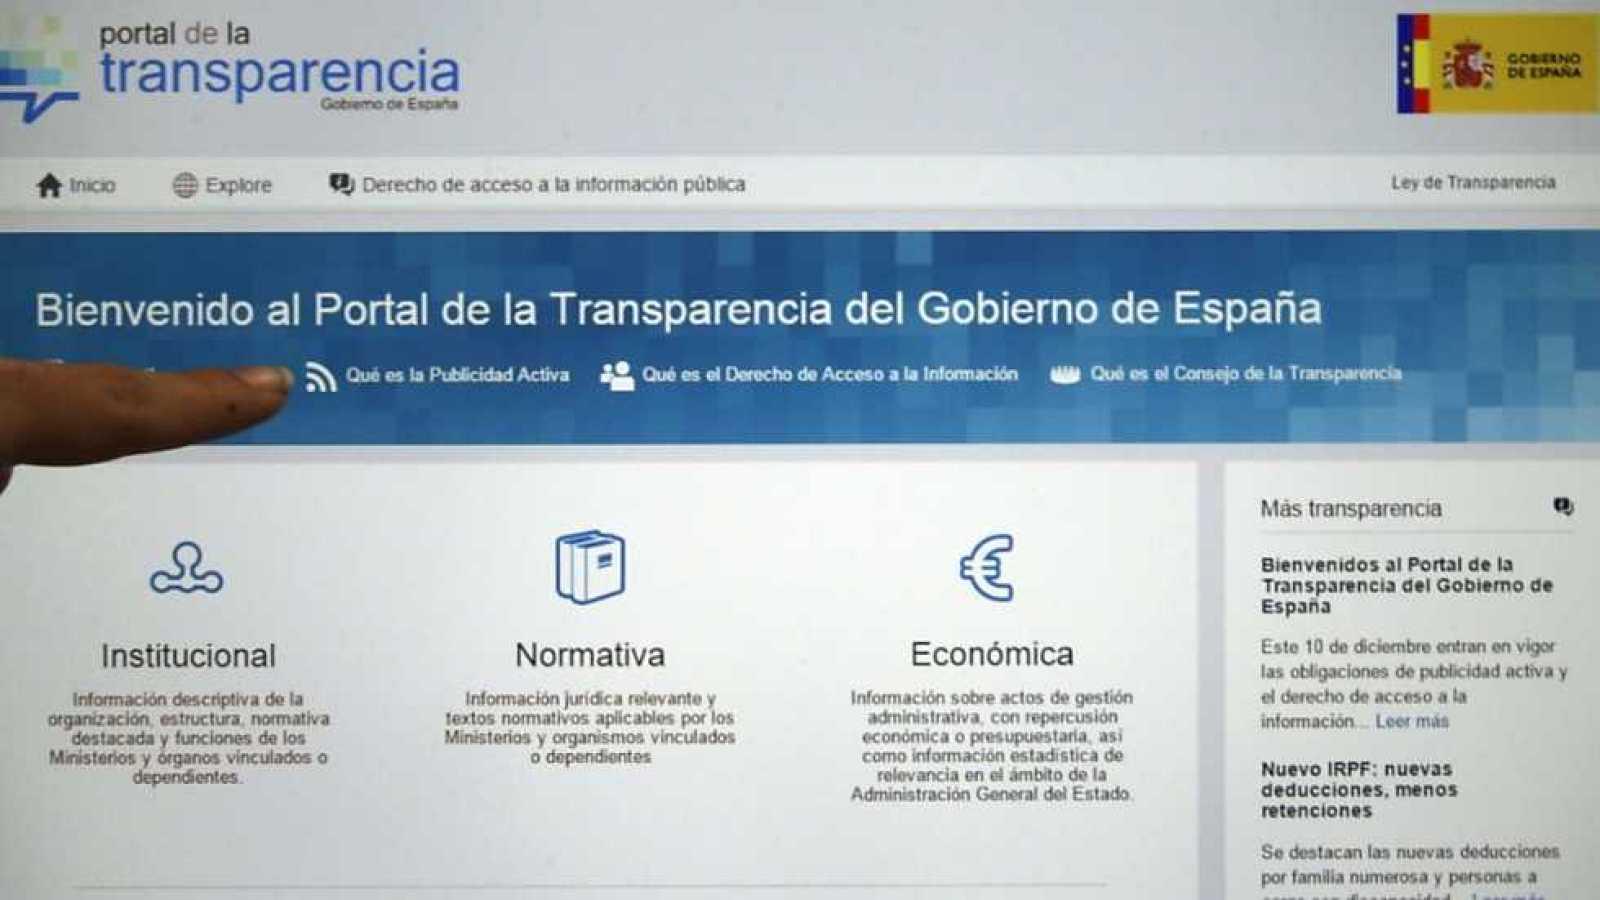 Telediario - 15 horas - 10/12/14 - RTVE.es